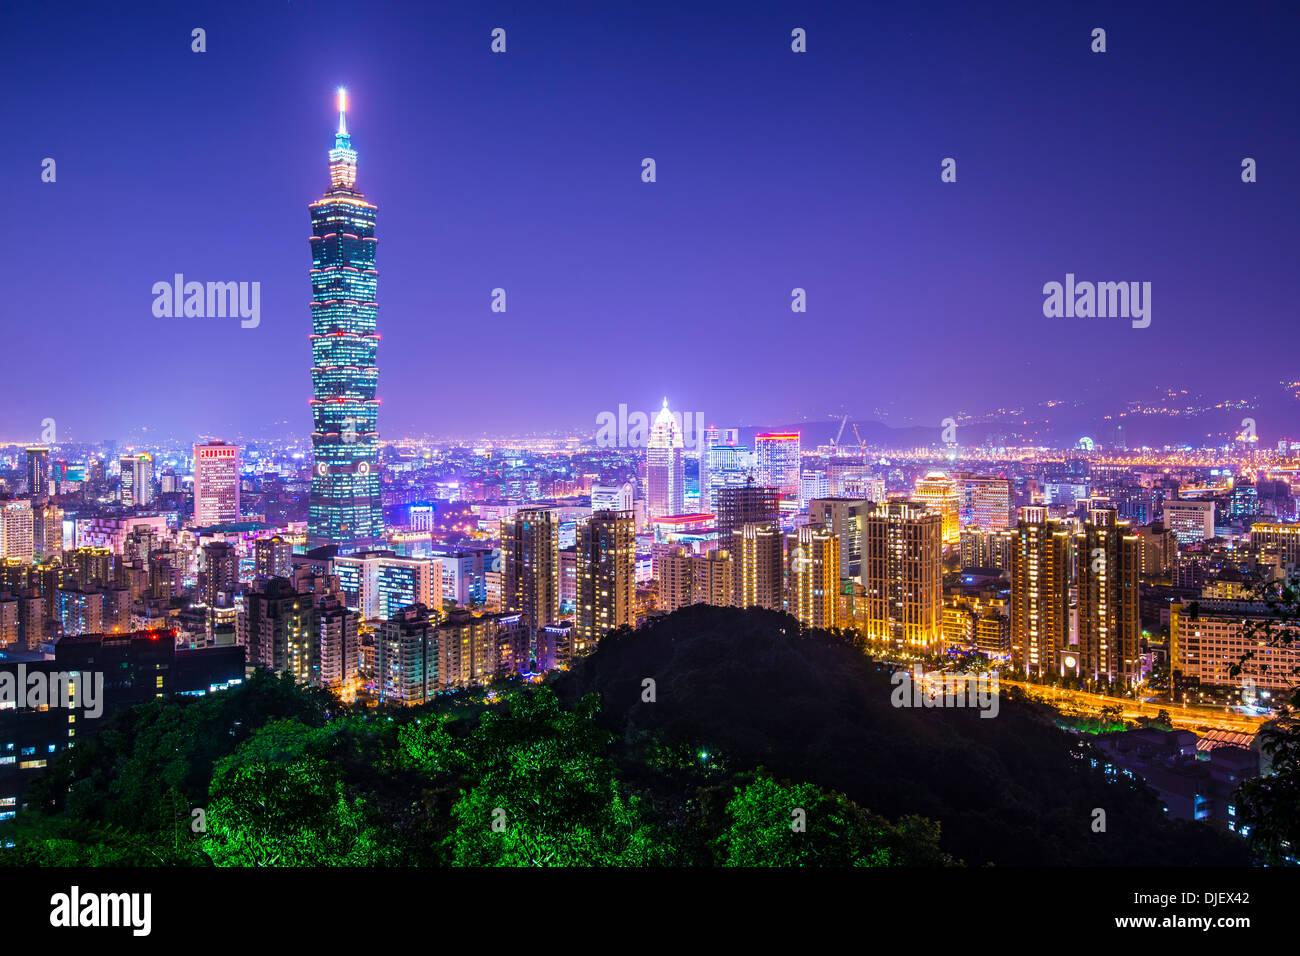 Modernos edificios de oficinas en Taipei, Taiwán en la noche. Imagen De Stock